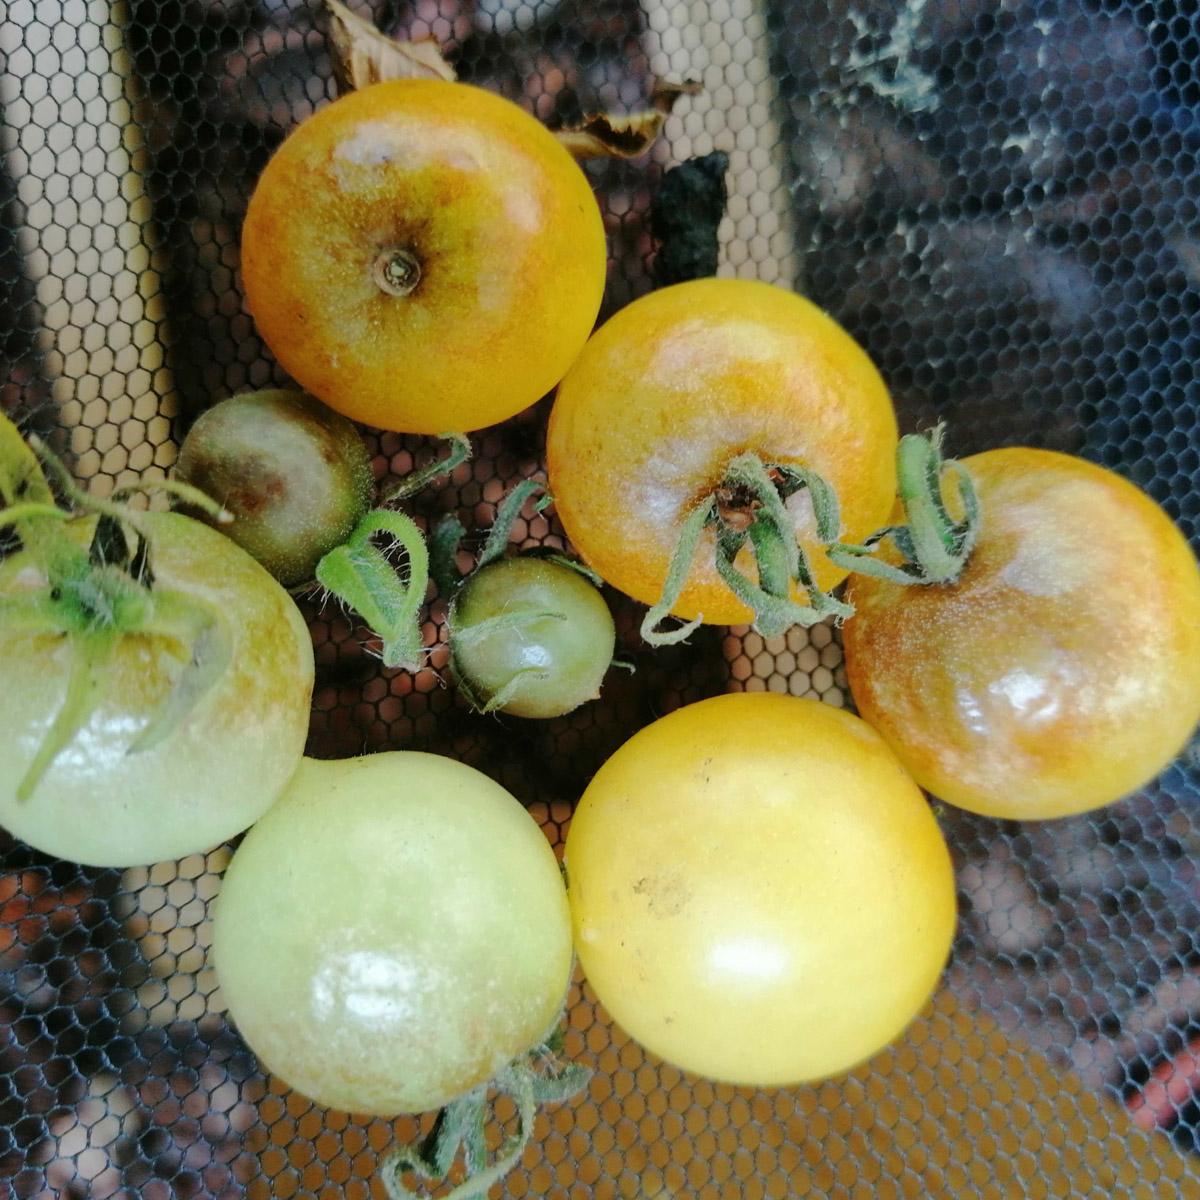 tomato-disease-action3.jpg